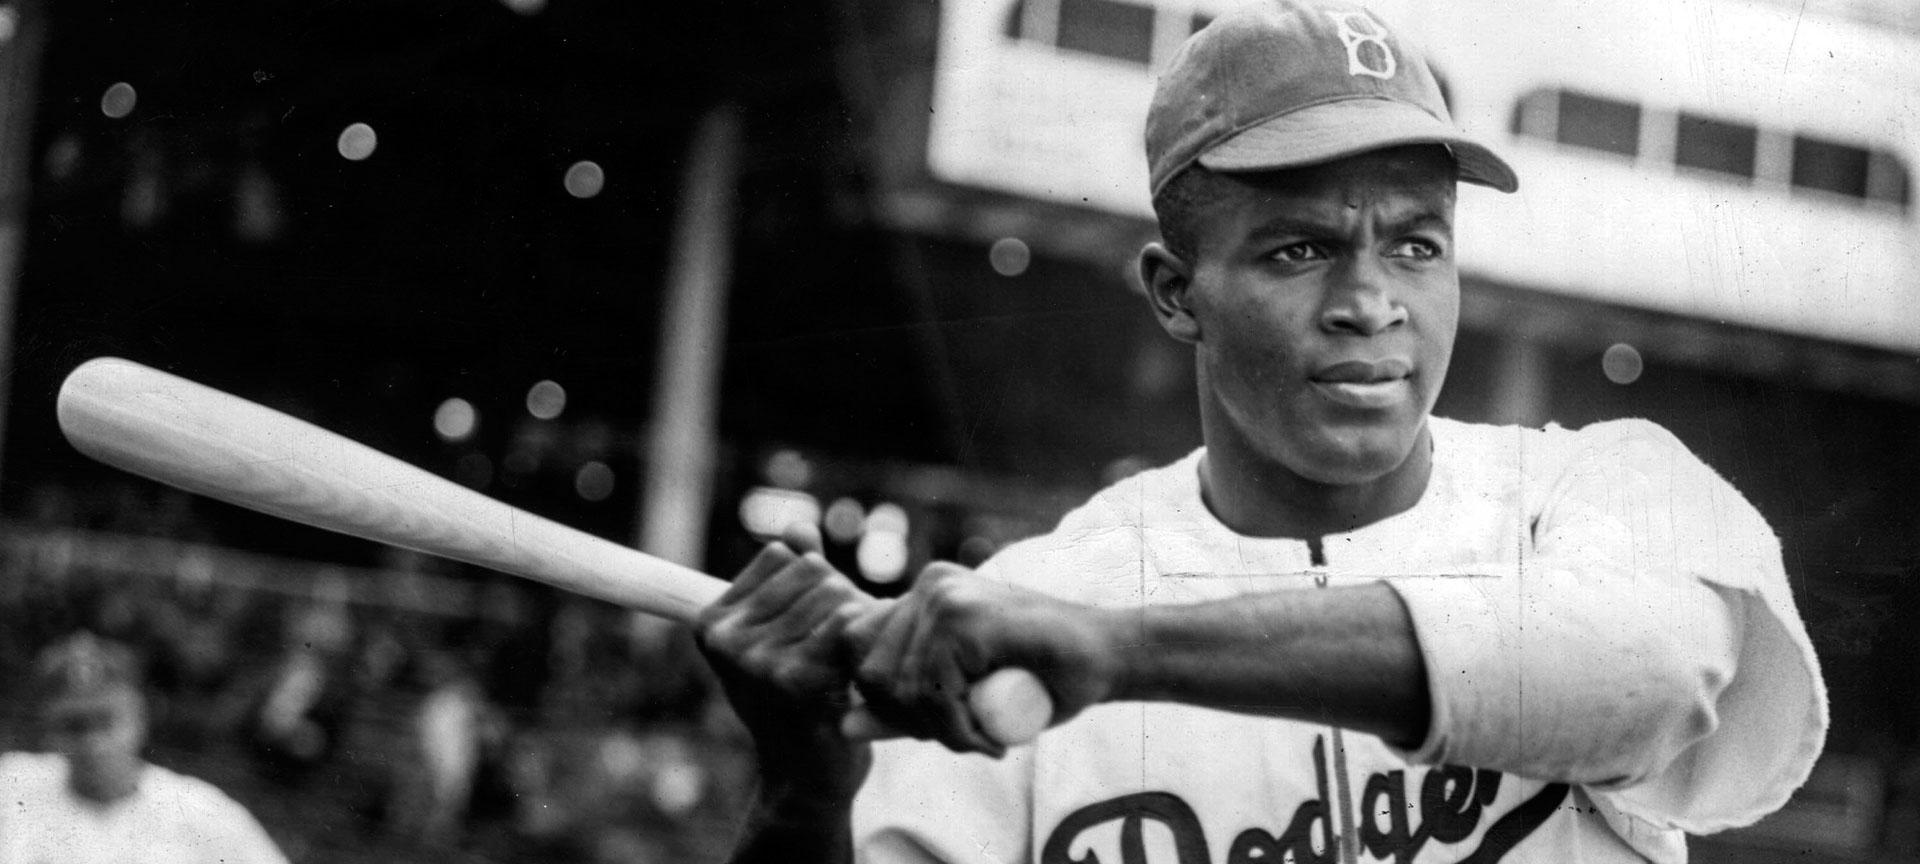 Jackie Robinson in a Brooklyn Dodgers uniform holding a baseball bat